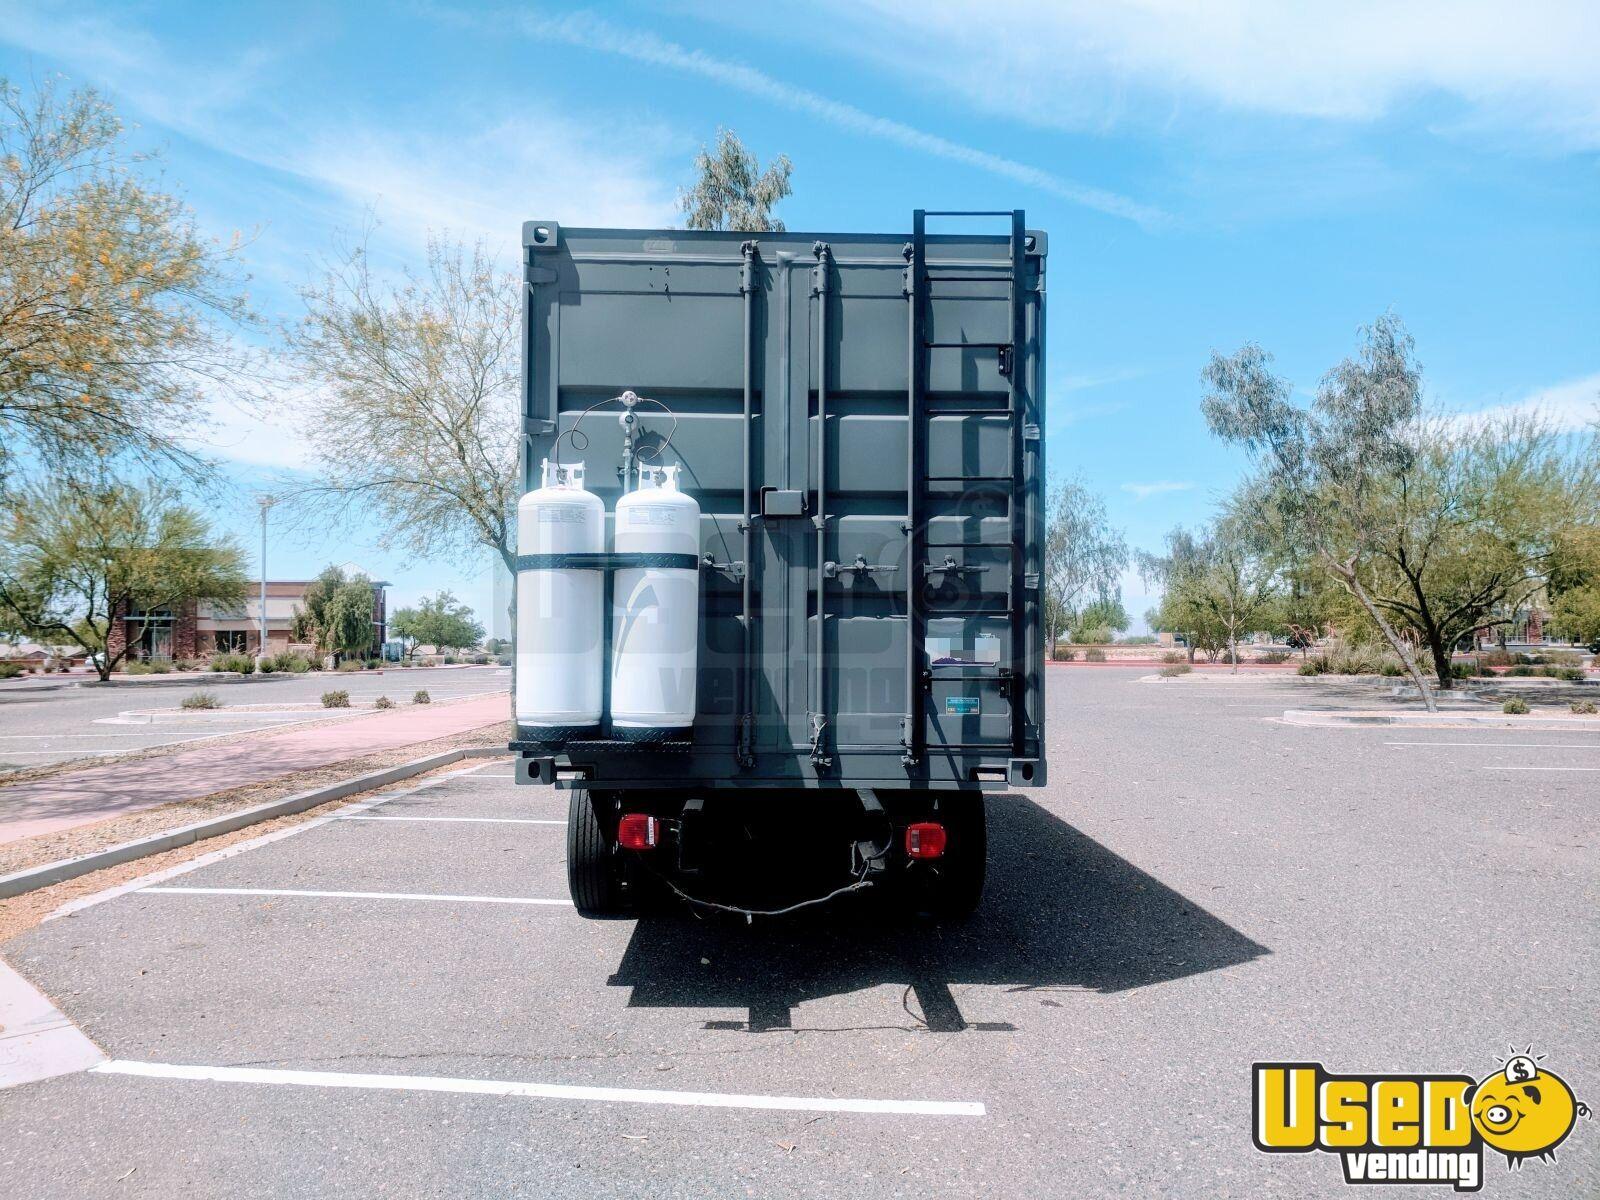 International Mobile Kitchen Pizza Truck for Sale in Arizona